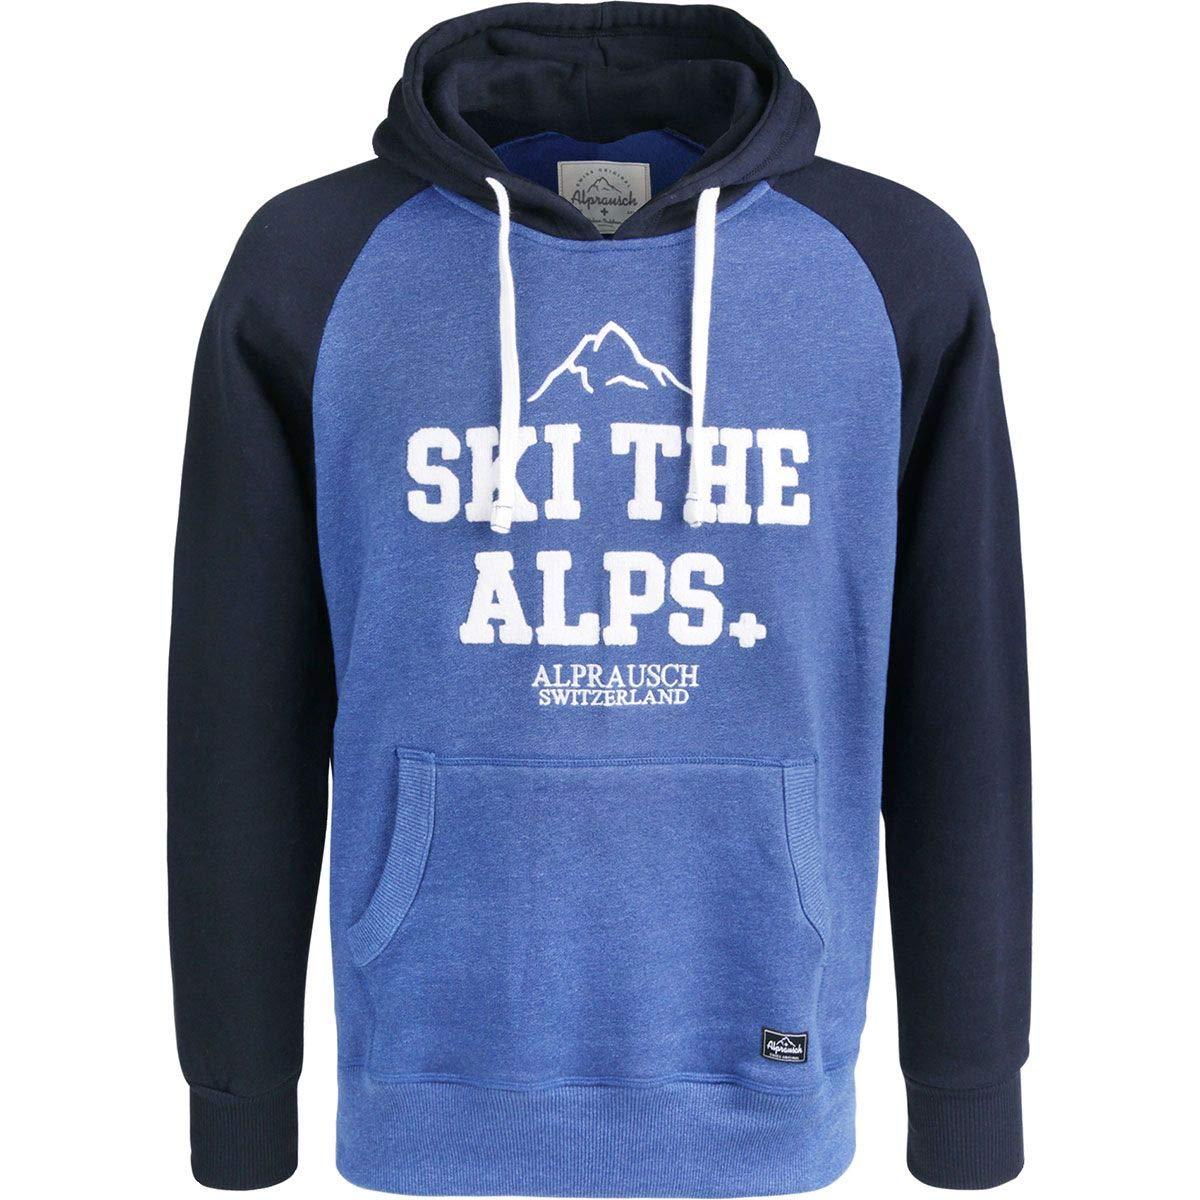 Alprausch Herren ski The alps Hoodie